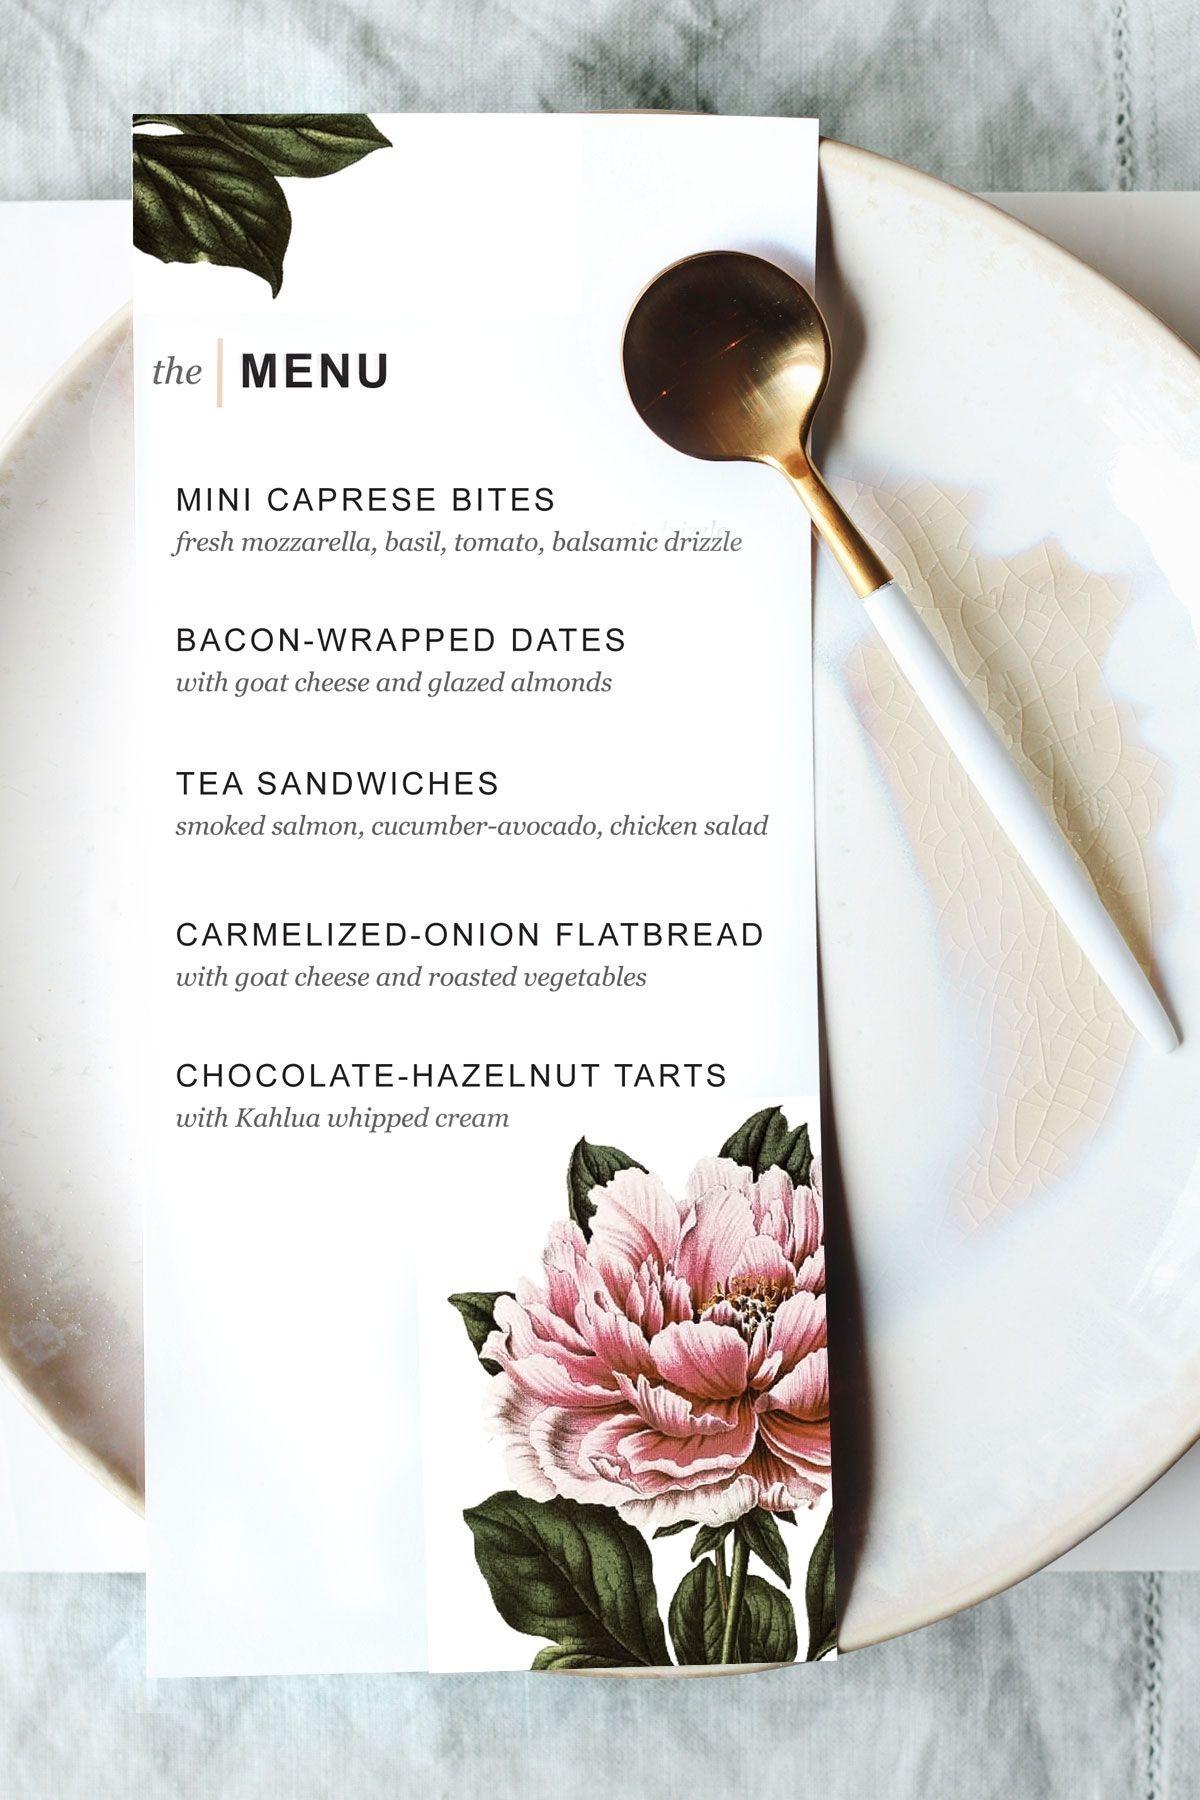 Printable Dinner Party Menu Template | Party Planning | Wedding Menu - Design A Menu For Free Printable